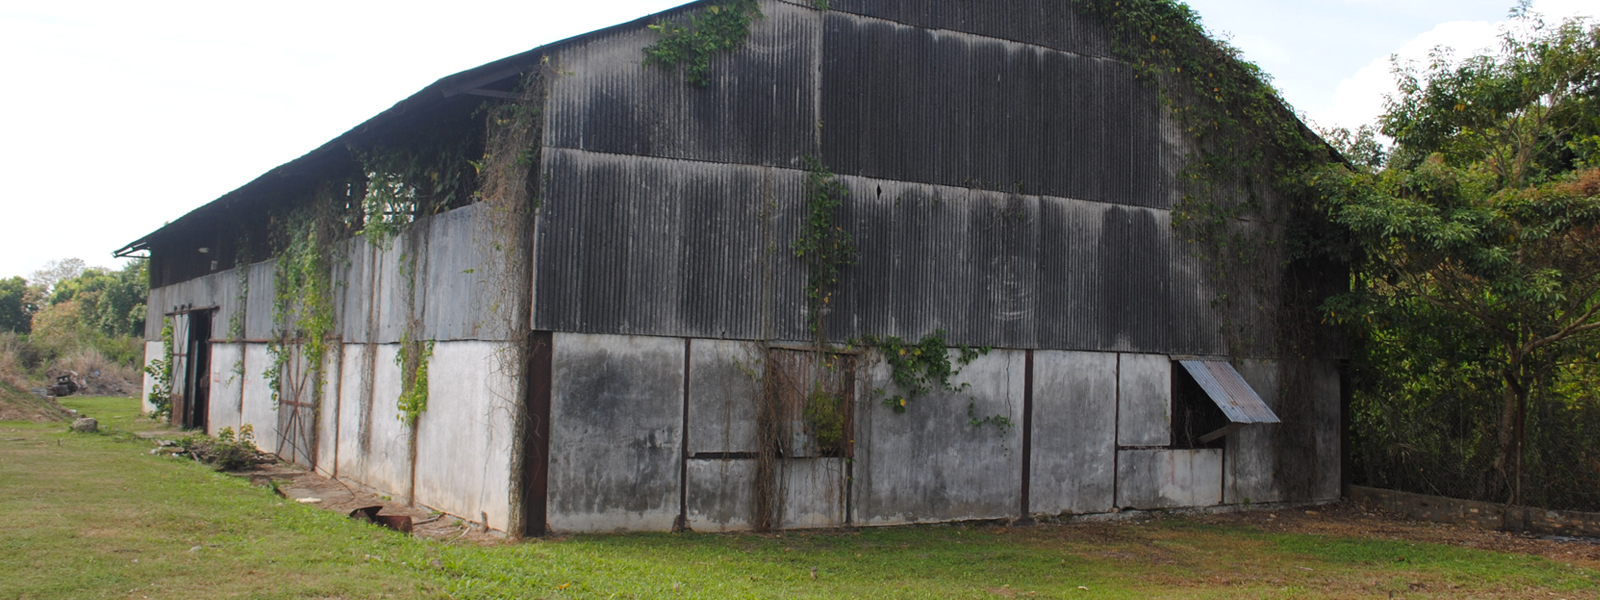 Caroni rum distillery